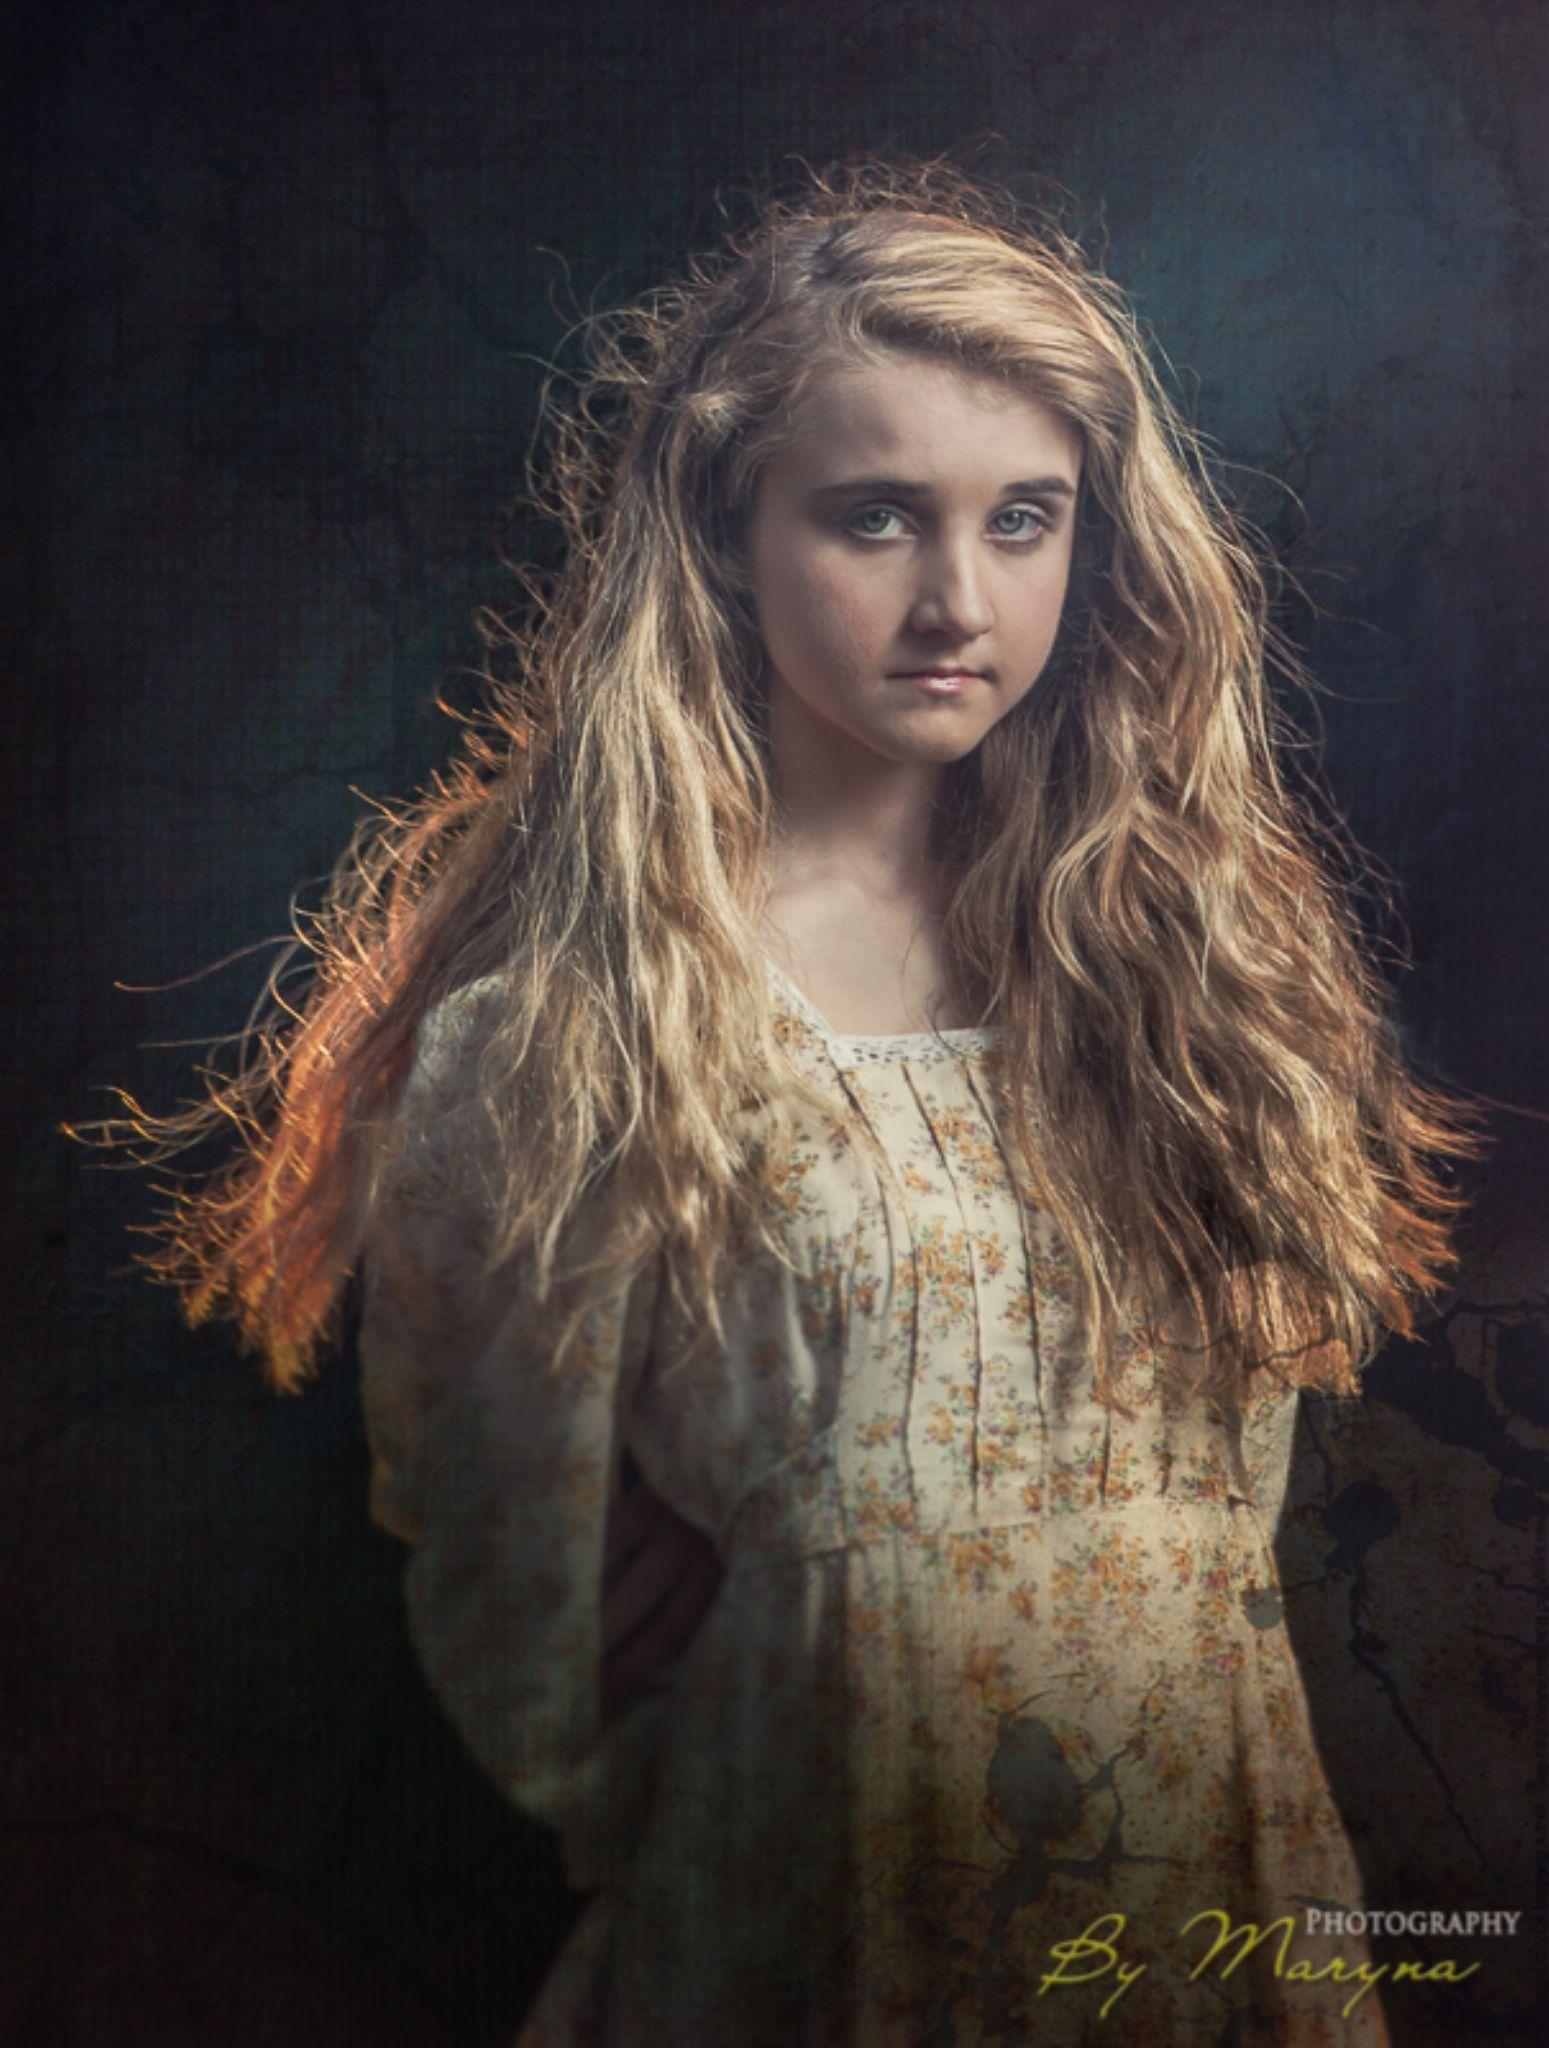 Haunted 3 series http://photographybymaryna.co.uk/2014/04/haunted-3-cornish-legends-project-treskill by Maryna Halton